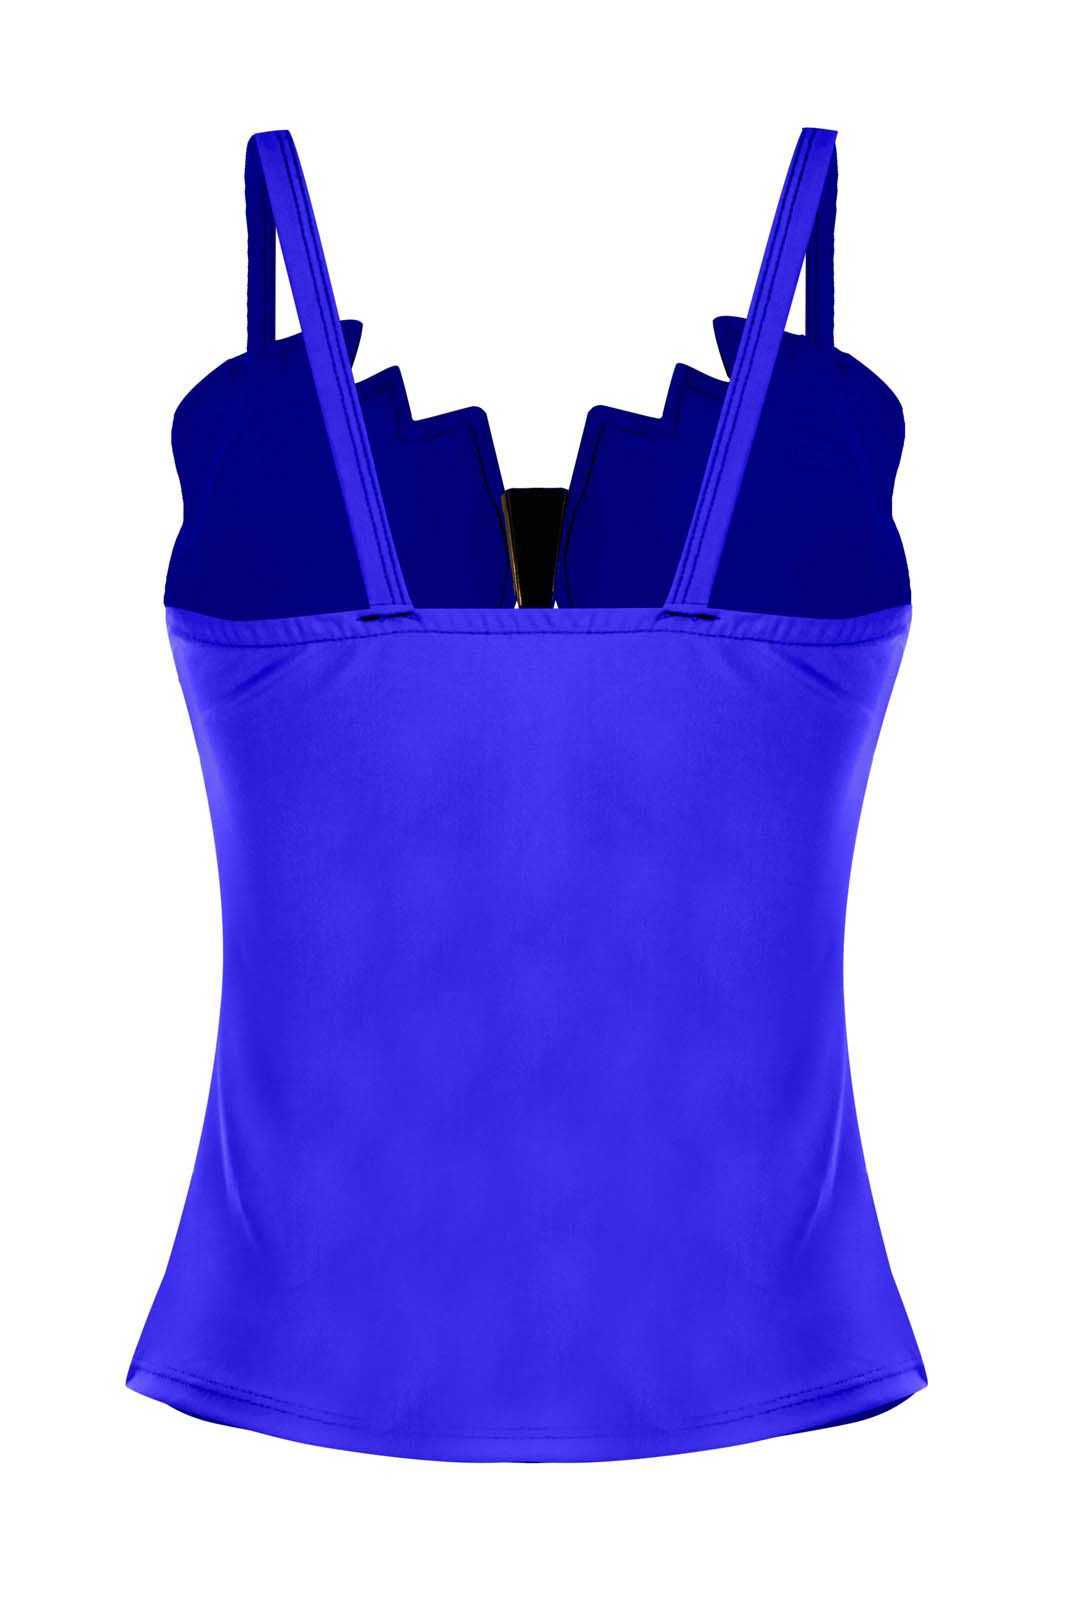 Regata OutletDri Suplex Alcinha Detalhe Gola Detalhe Fivela Metal Azul Royal